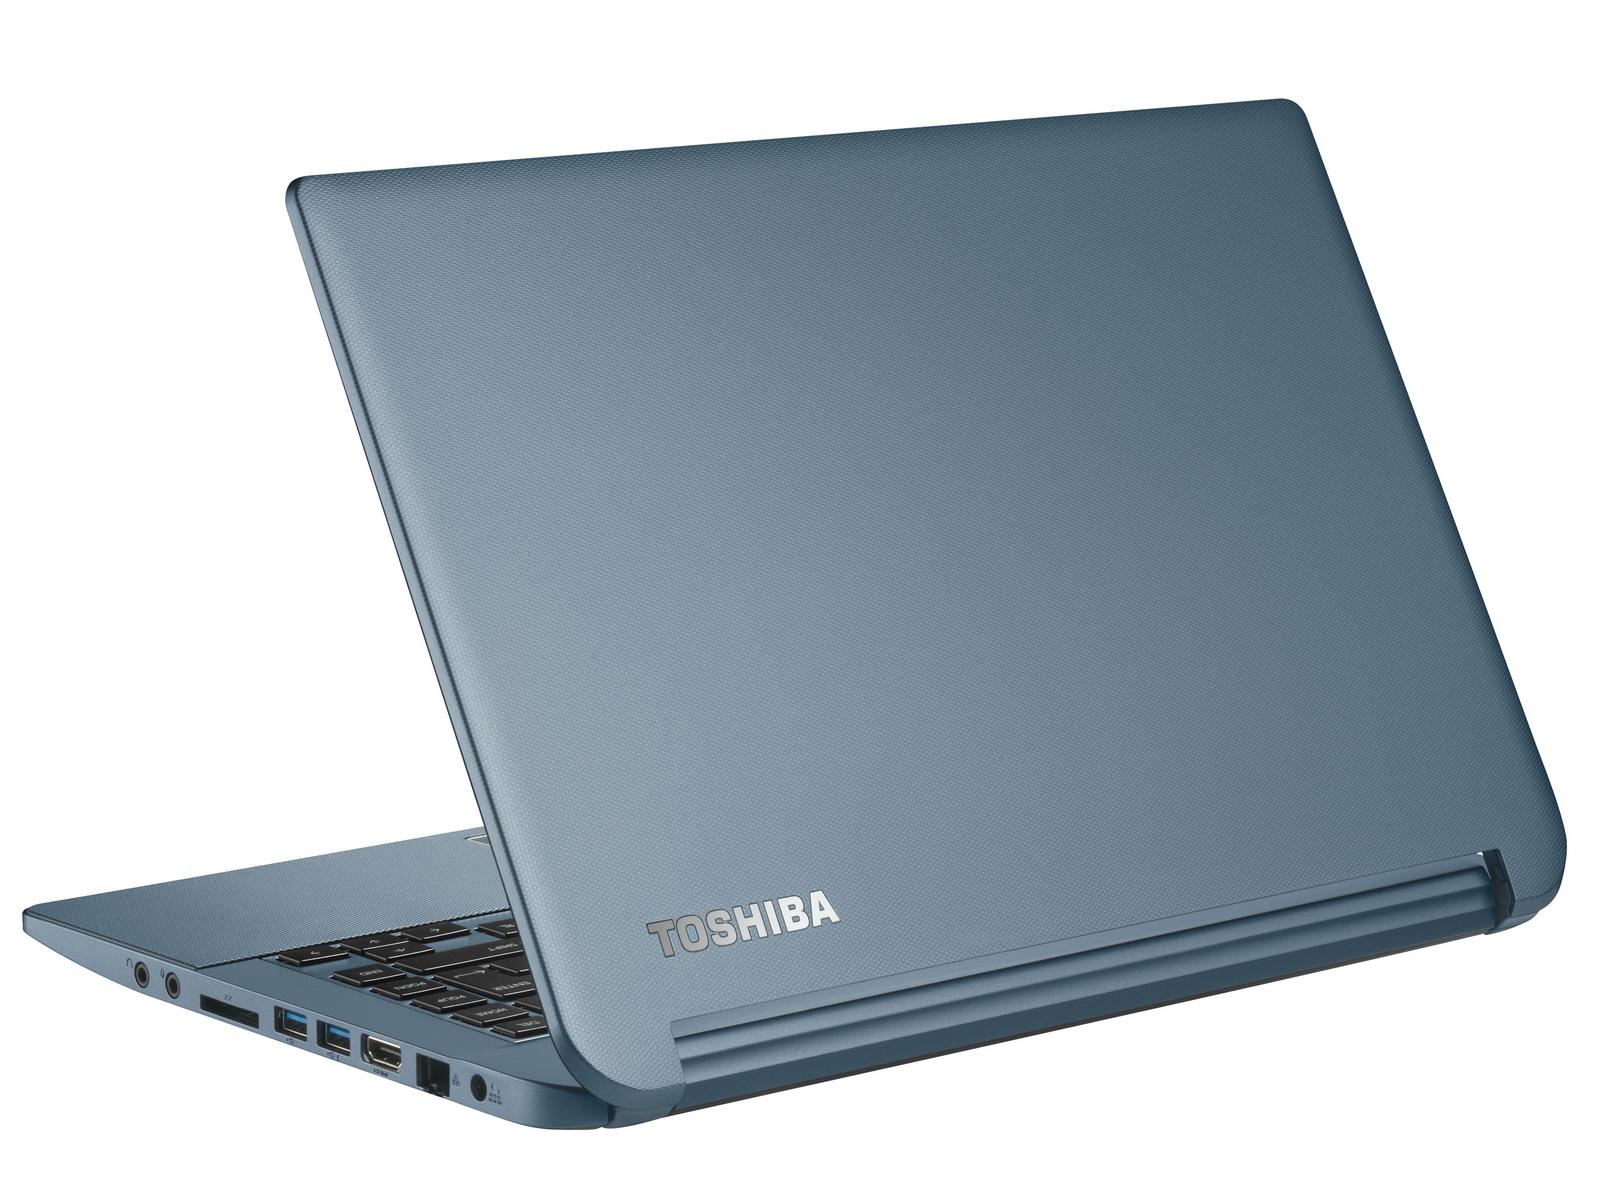 Toshiba u940 dqs 4